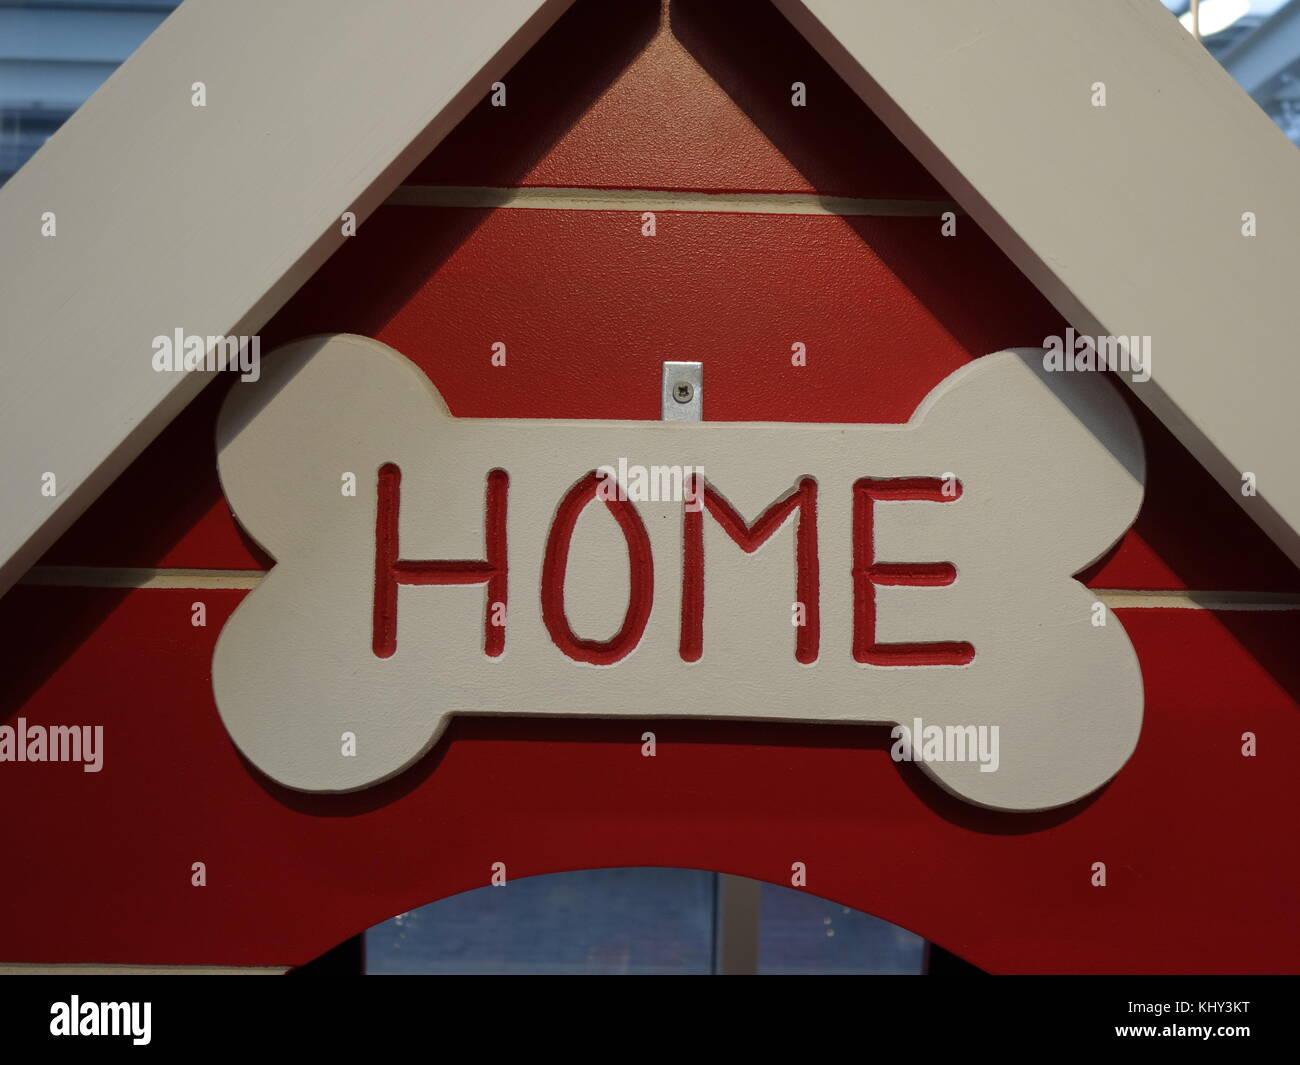 home sweet bone - Stock Image